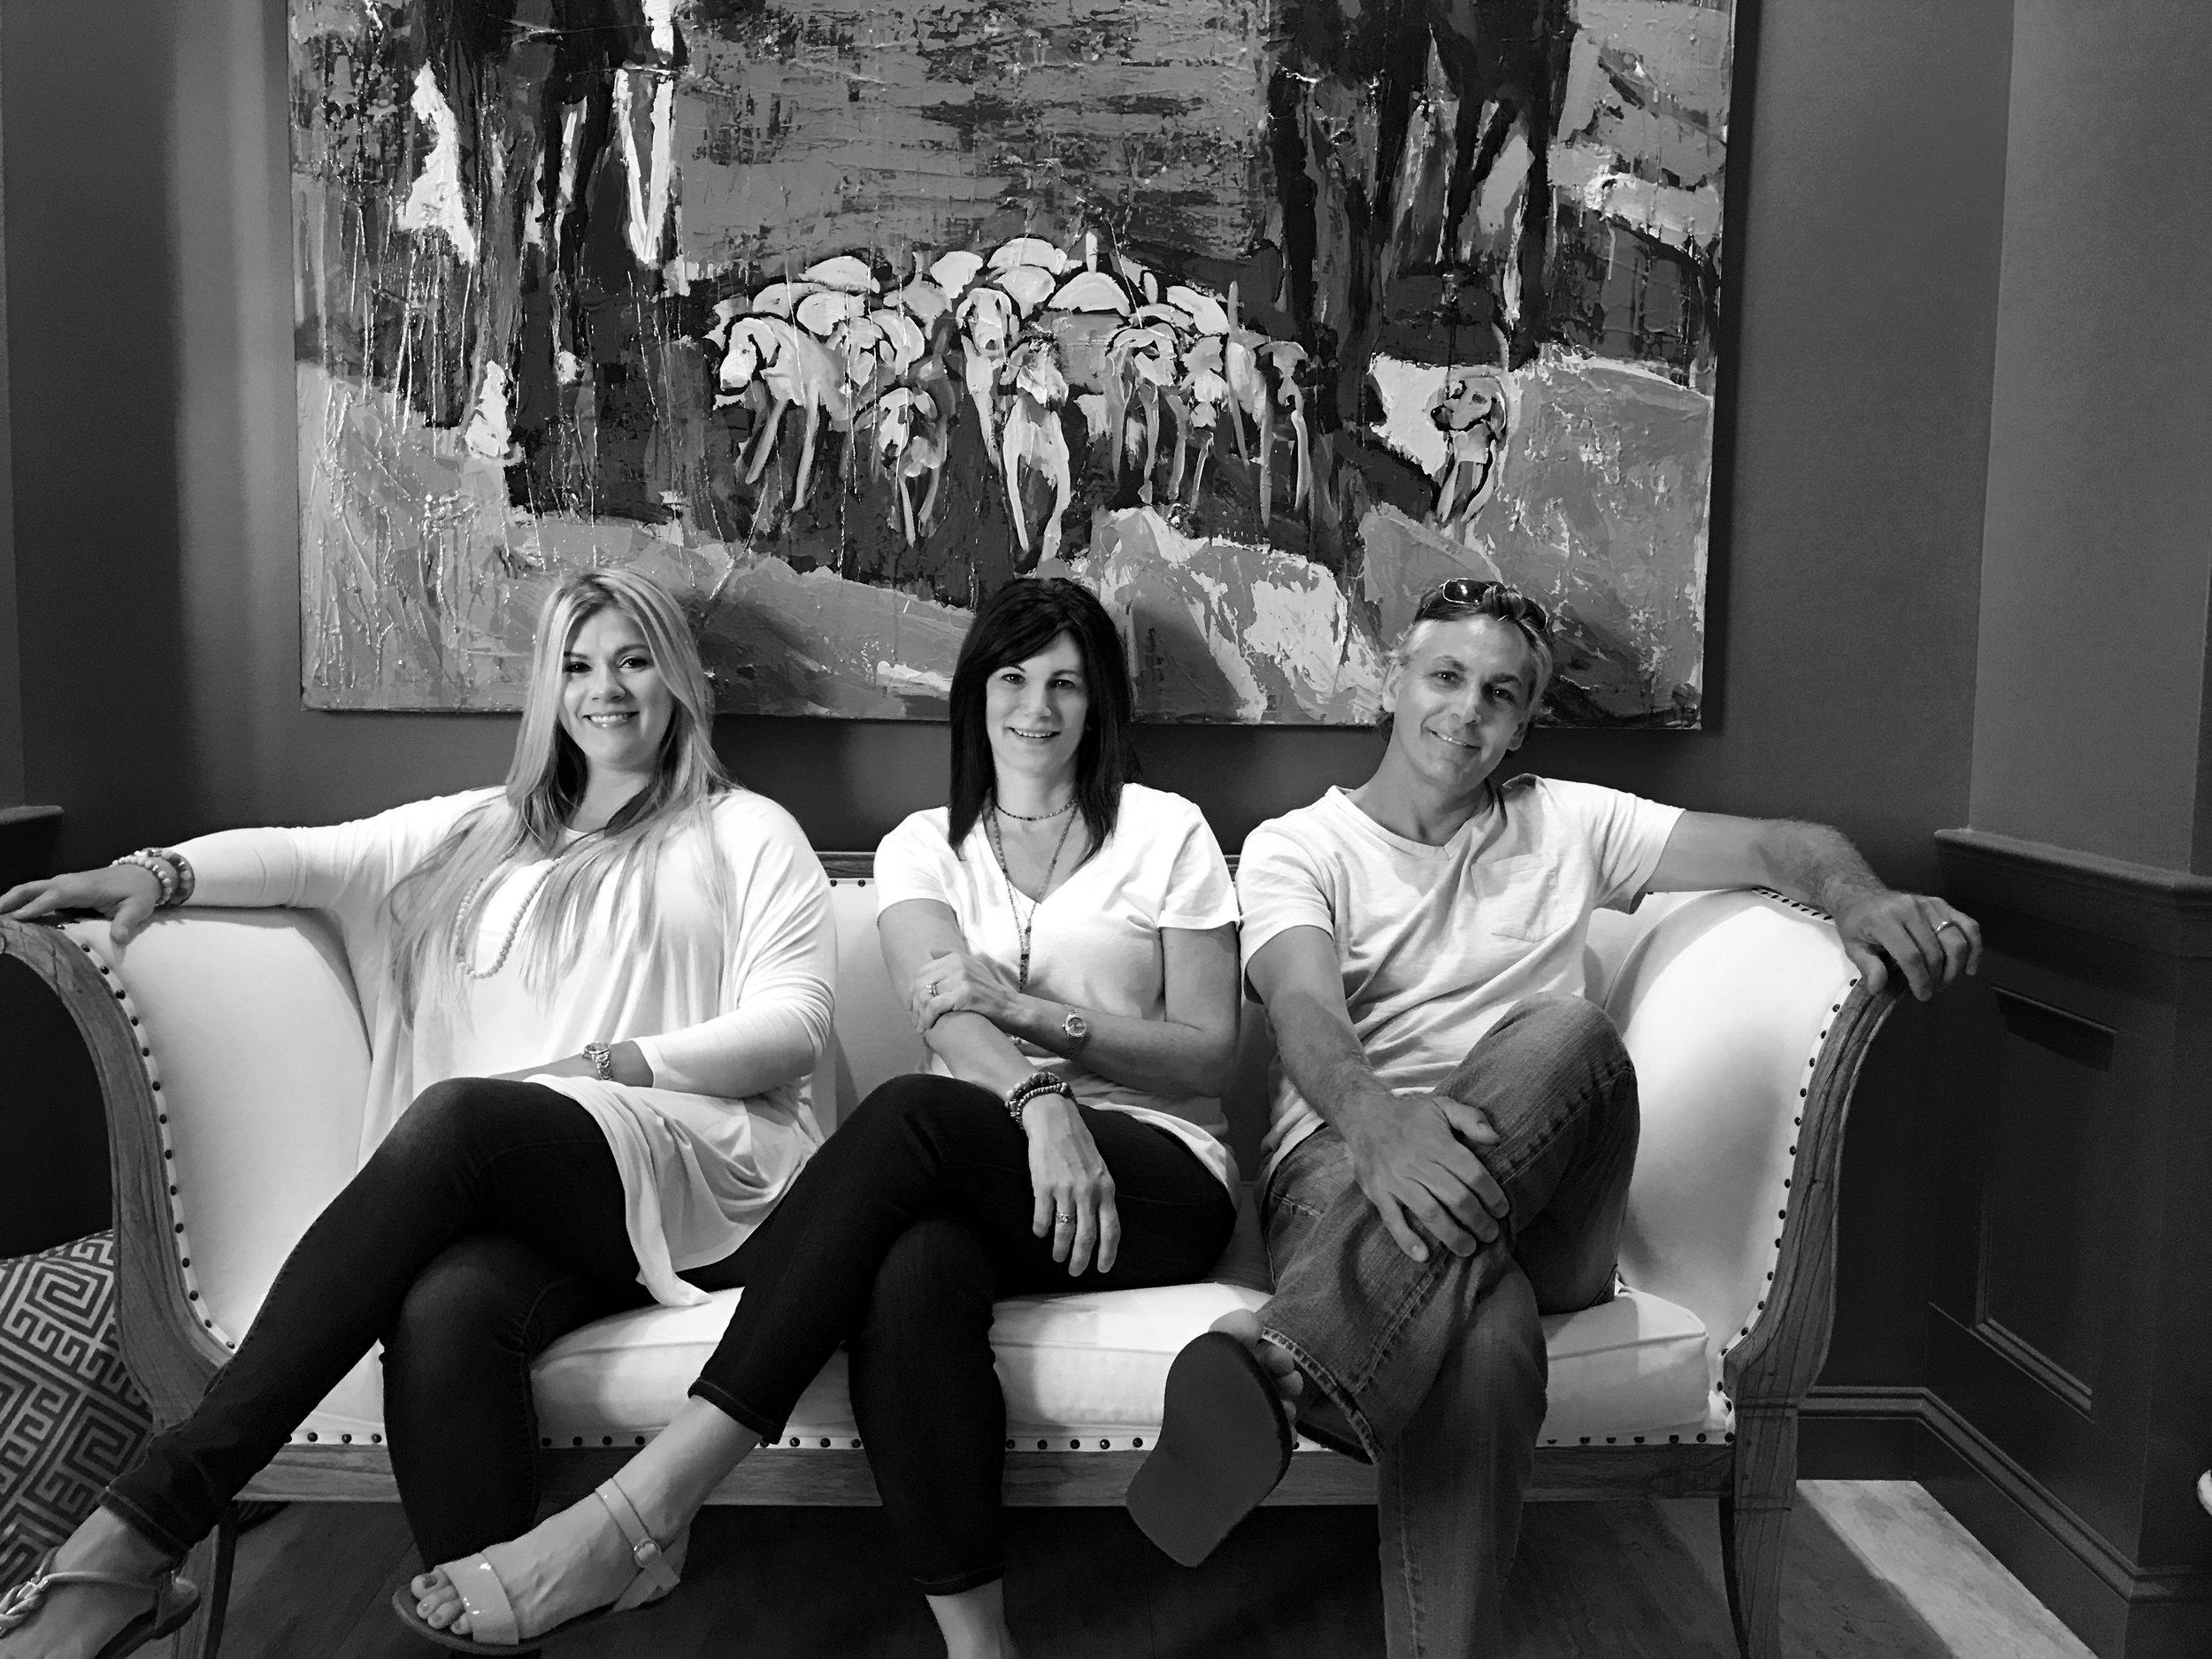 Kiley Guidry, Social Media Director | Christy Owenby, Founder & Creative Director | Paul Snow, Partner & Business Development